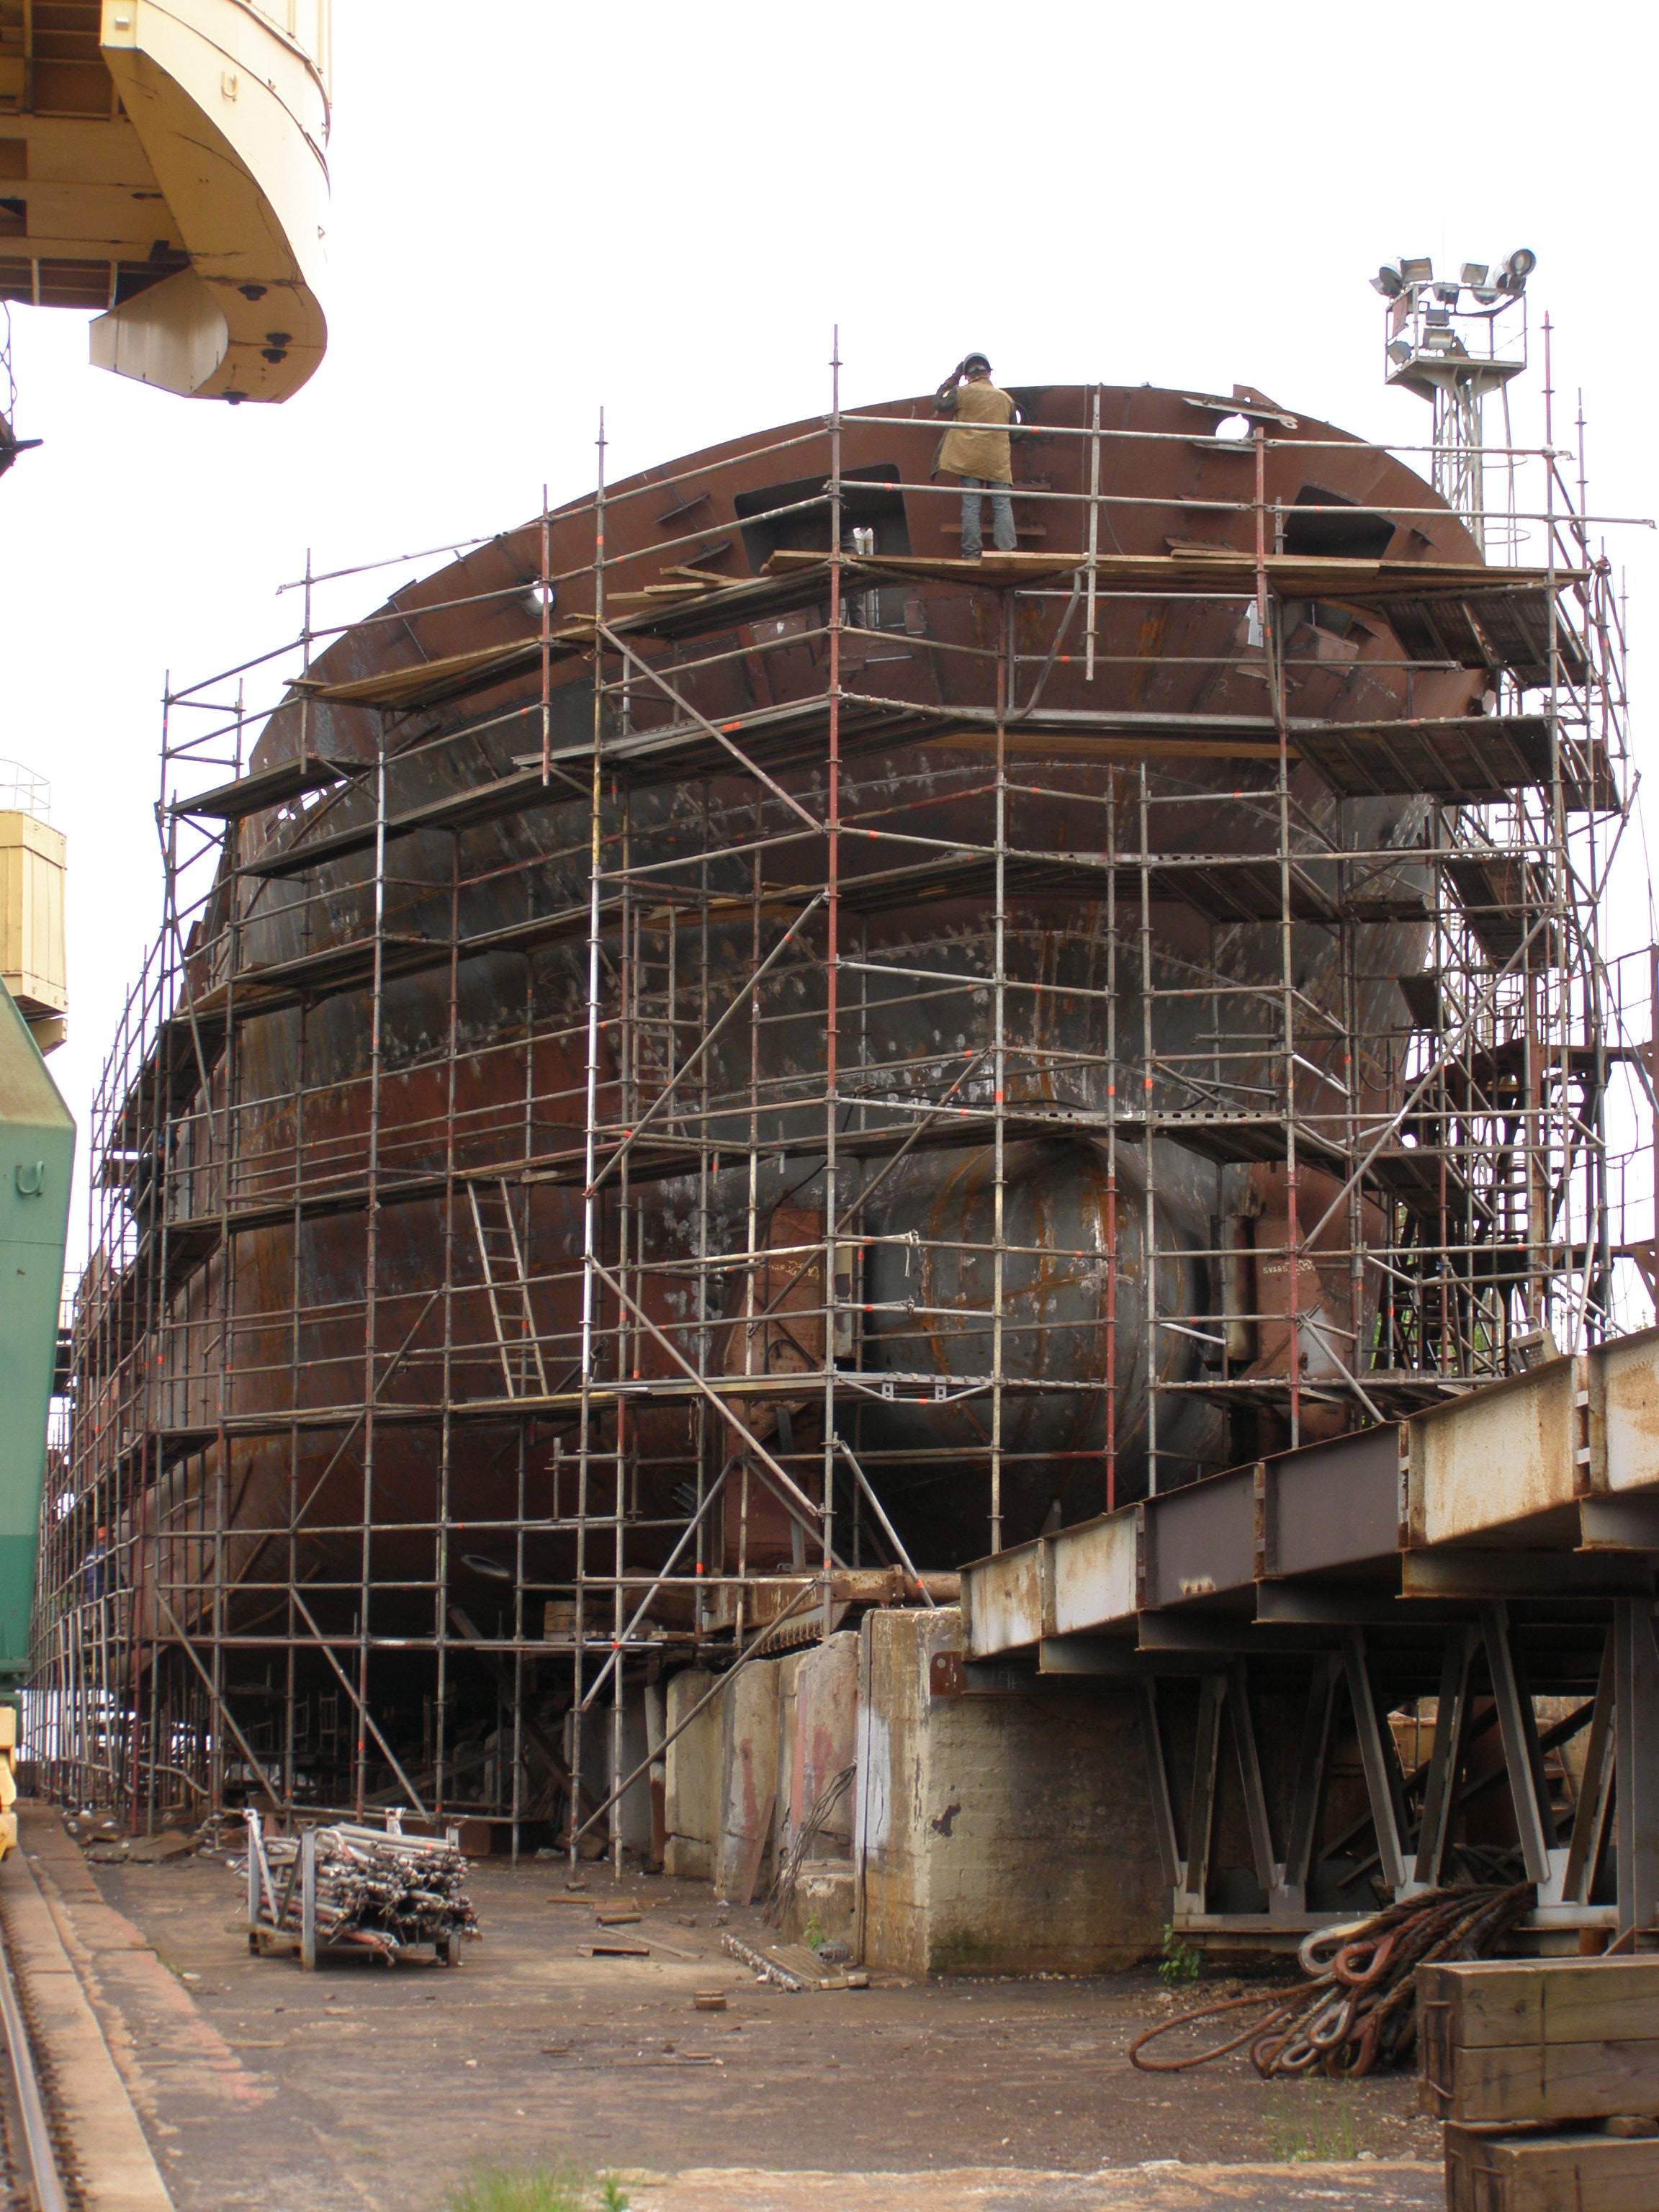 Maritek Ltd Shipbuilding Services